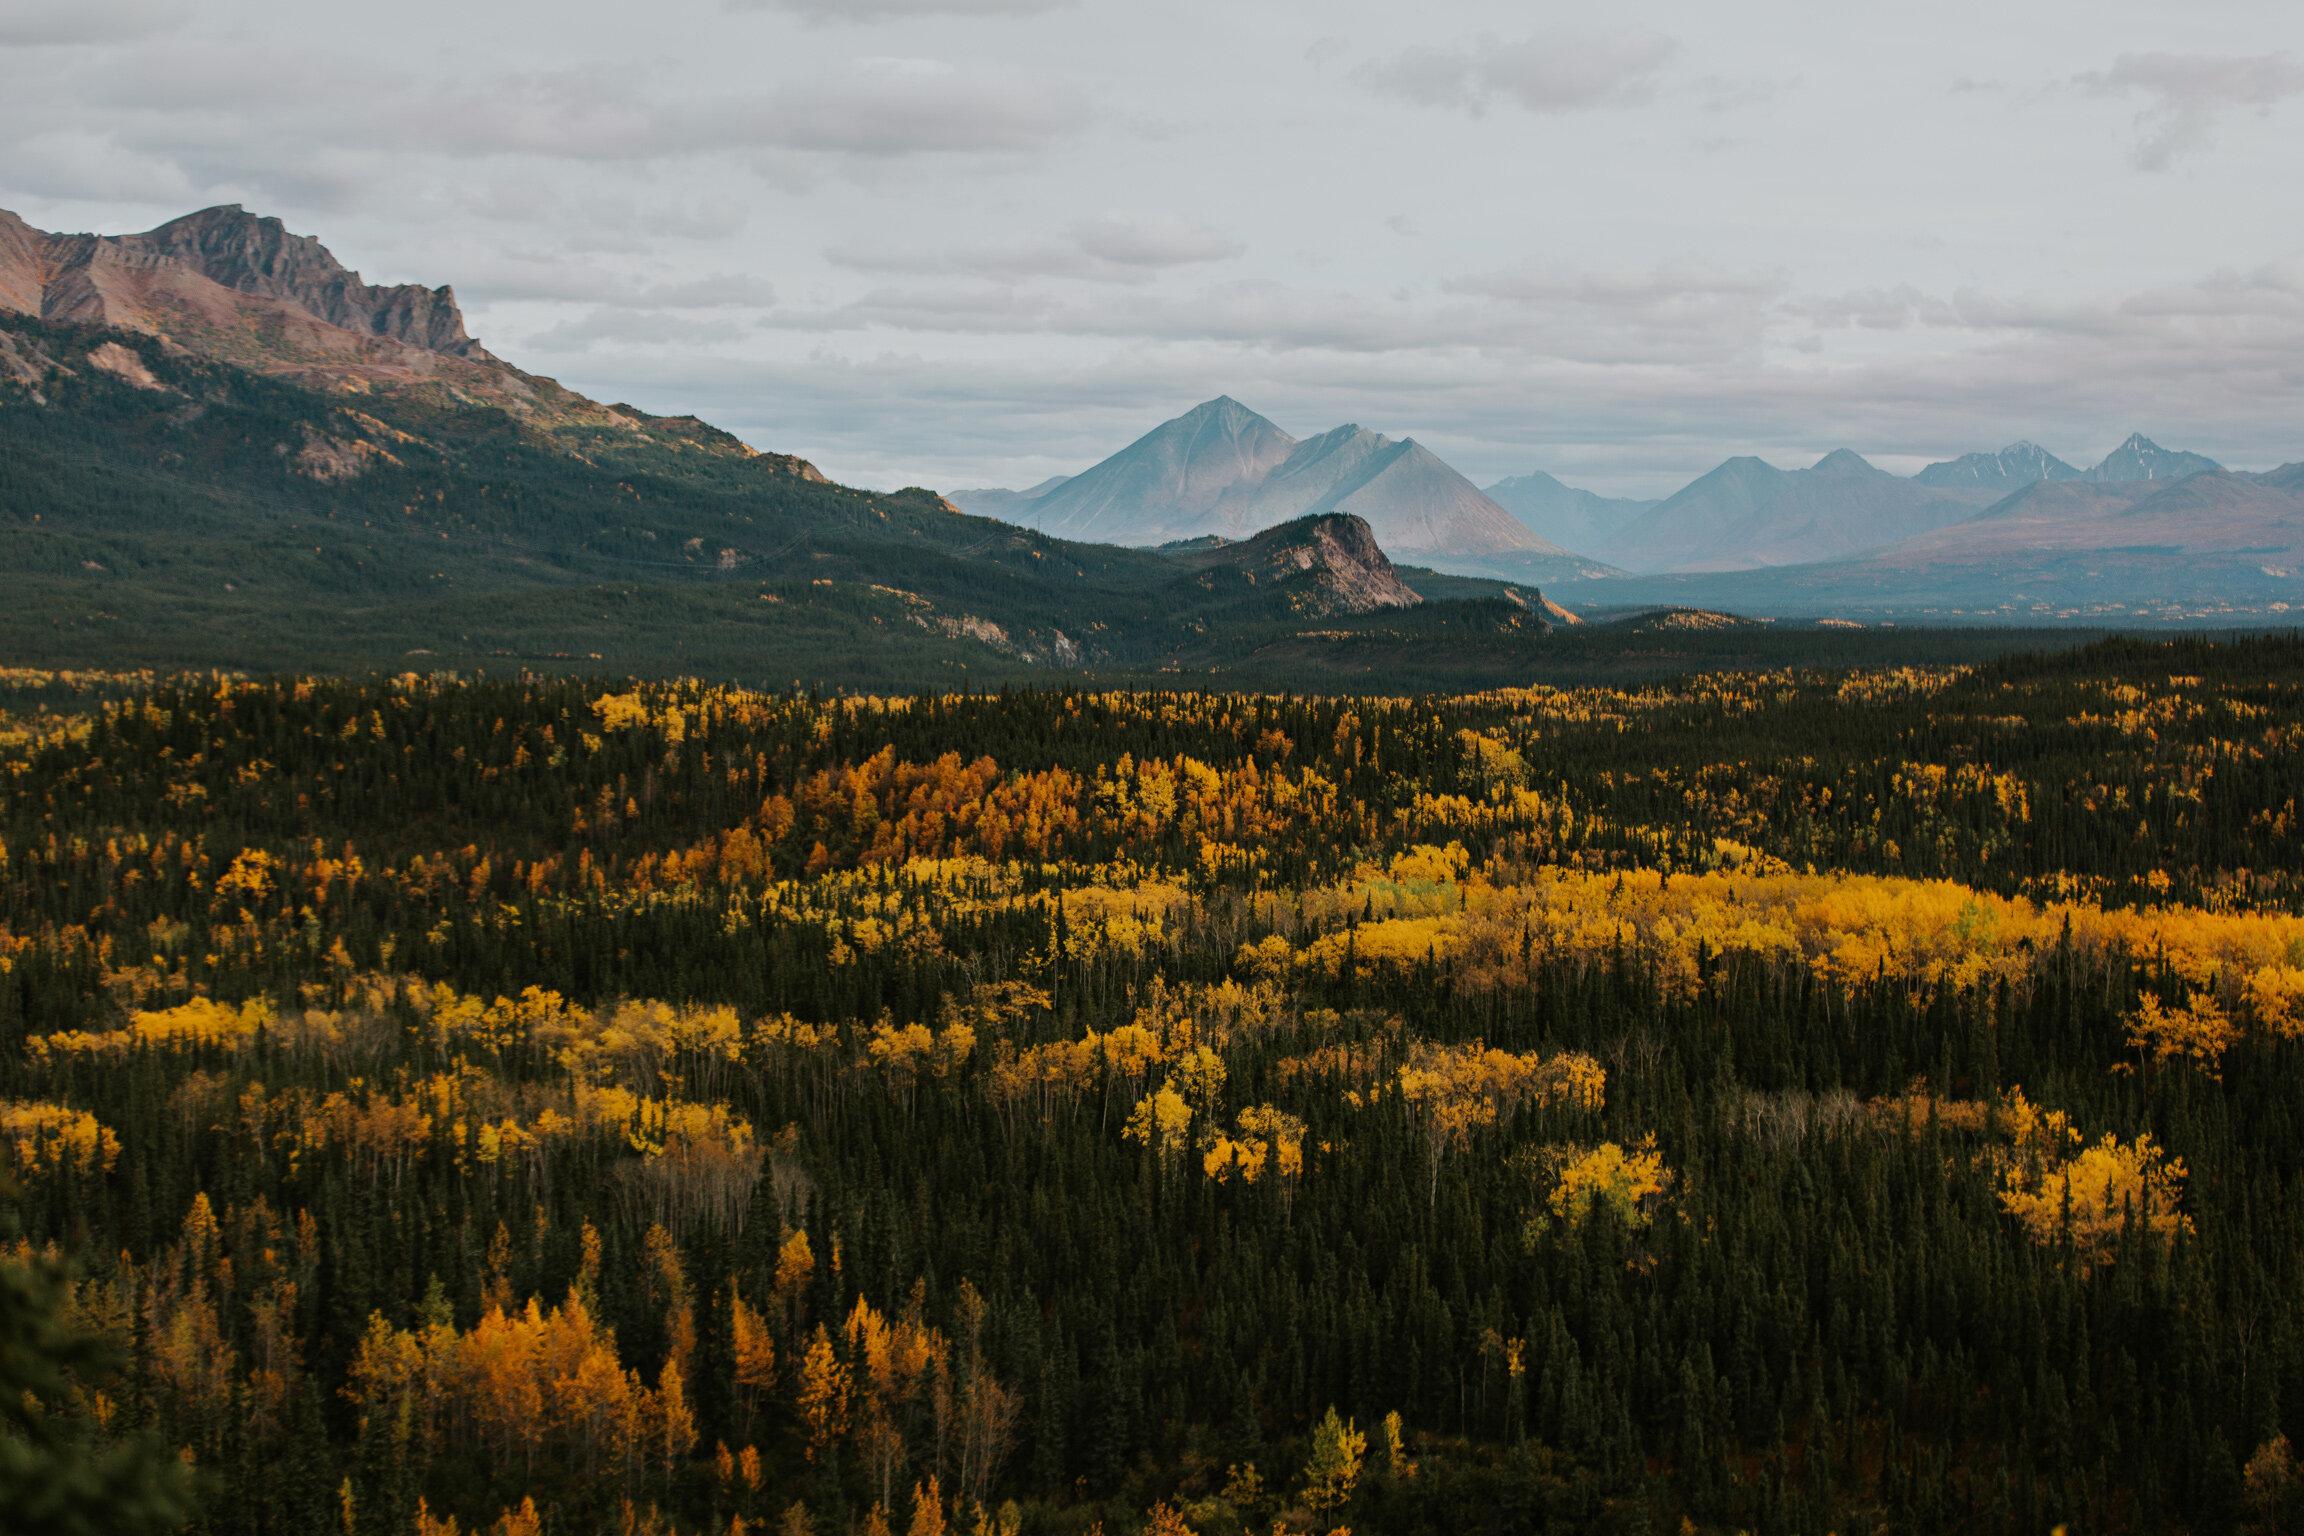 CindyGiovagnoli_Denali_Nation_Park_Alaska_autumn_fall_camping_outdoors-002.jpg